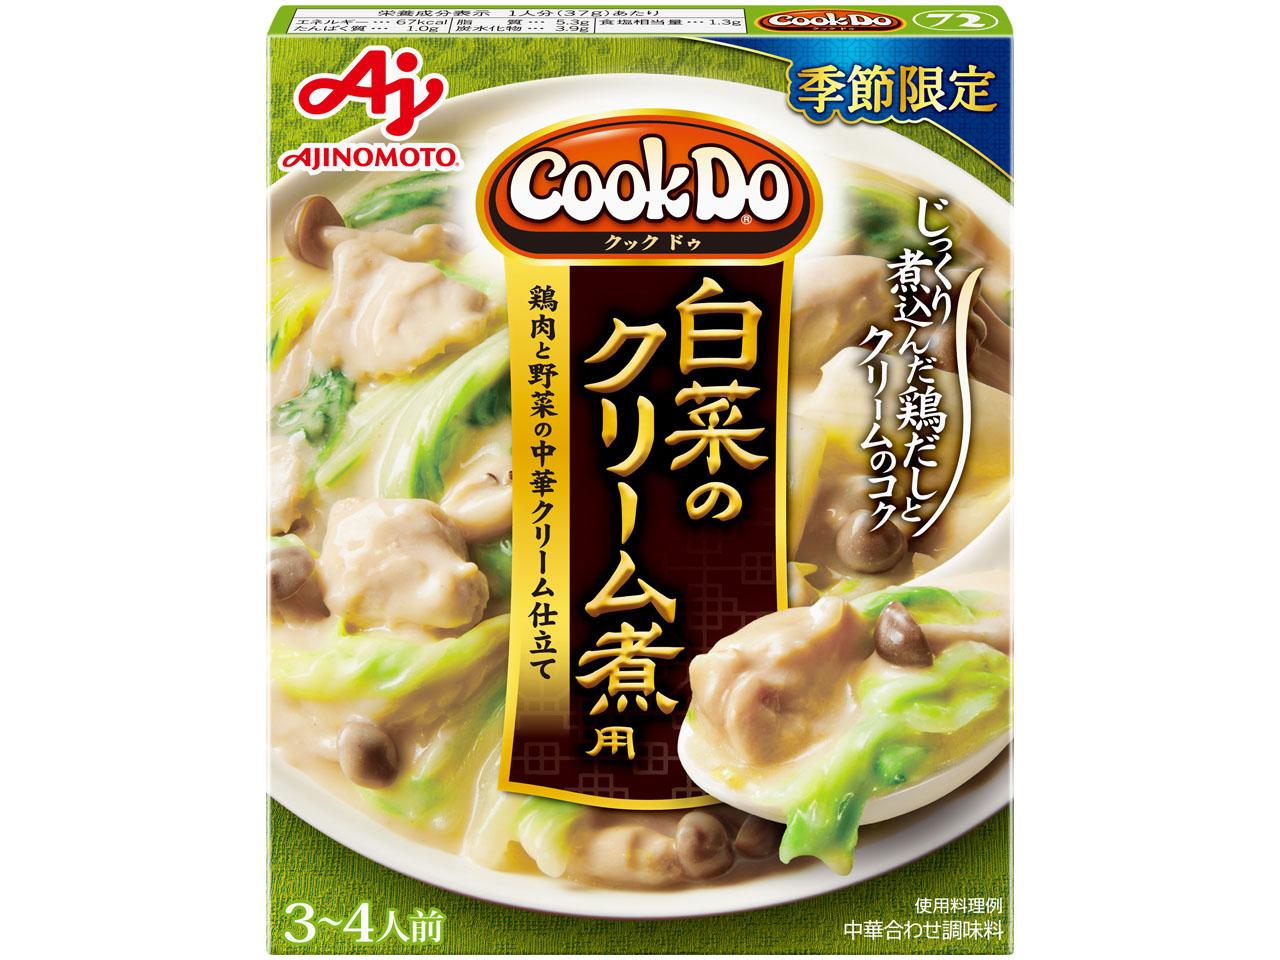 「Cook Do」白菜のクリーム煮用